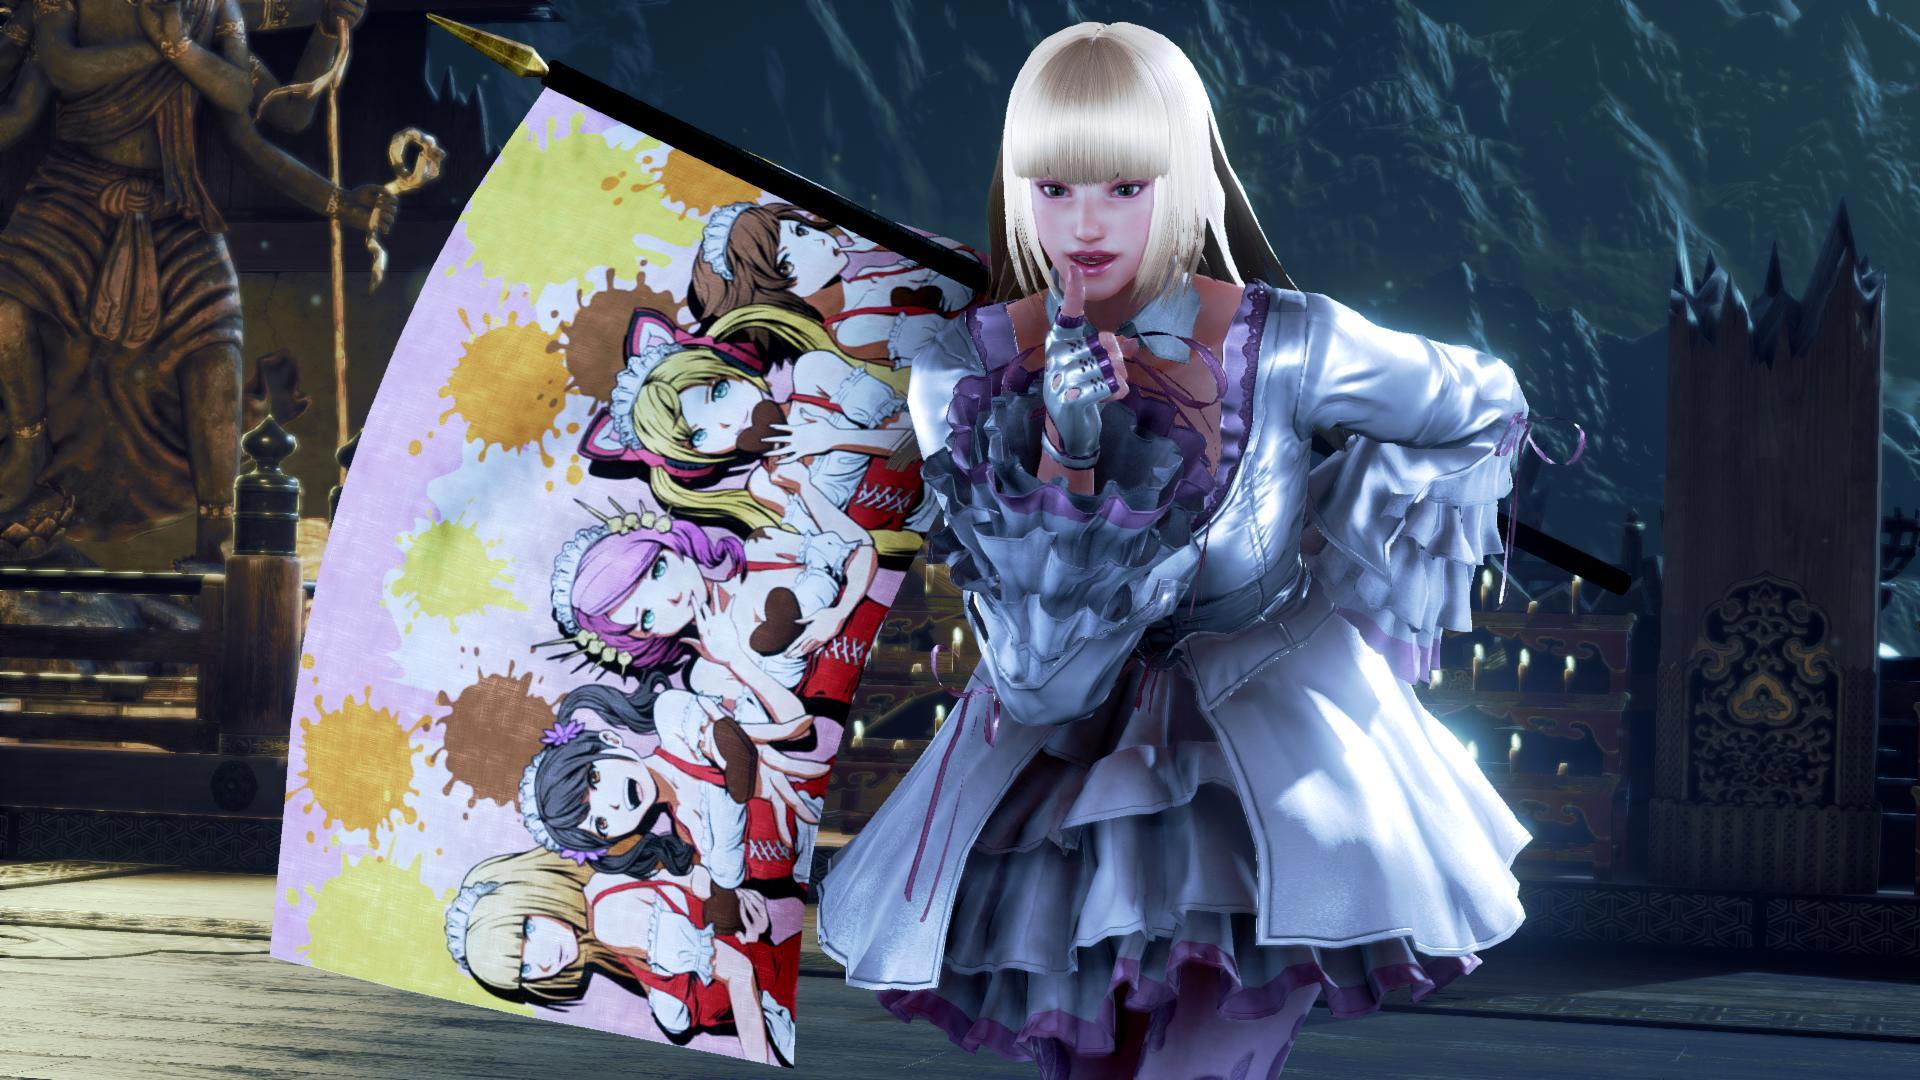 Tekken 7 Anniversary Update 3 out of 8 image gallery